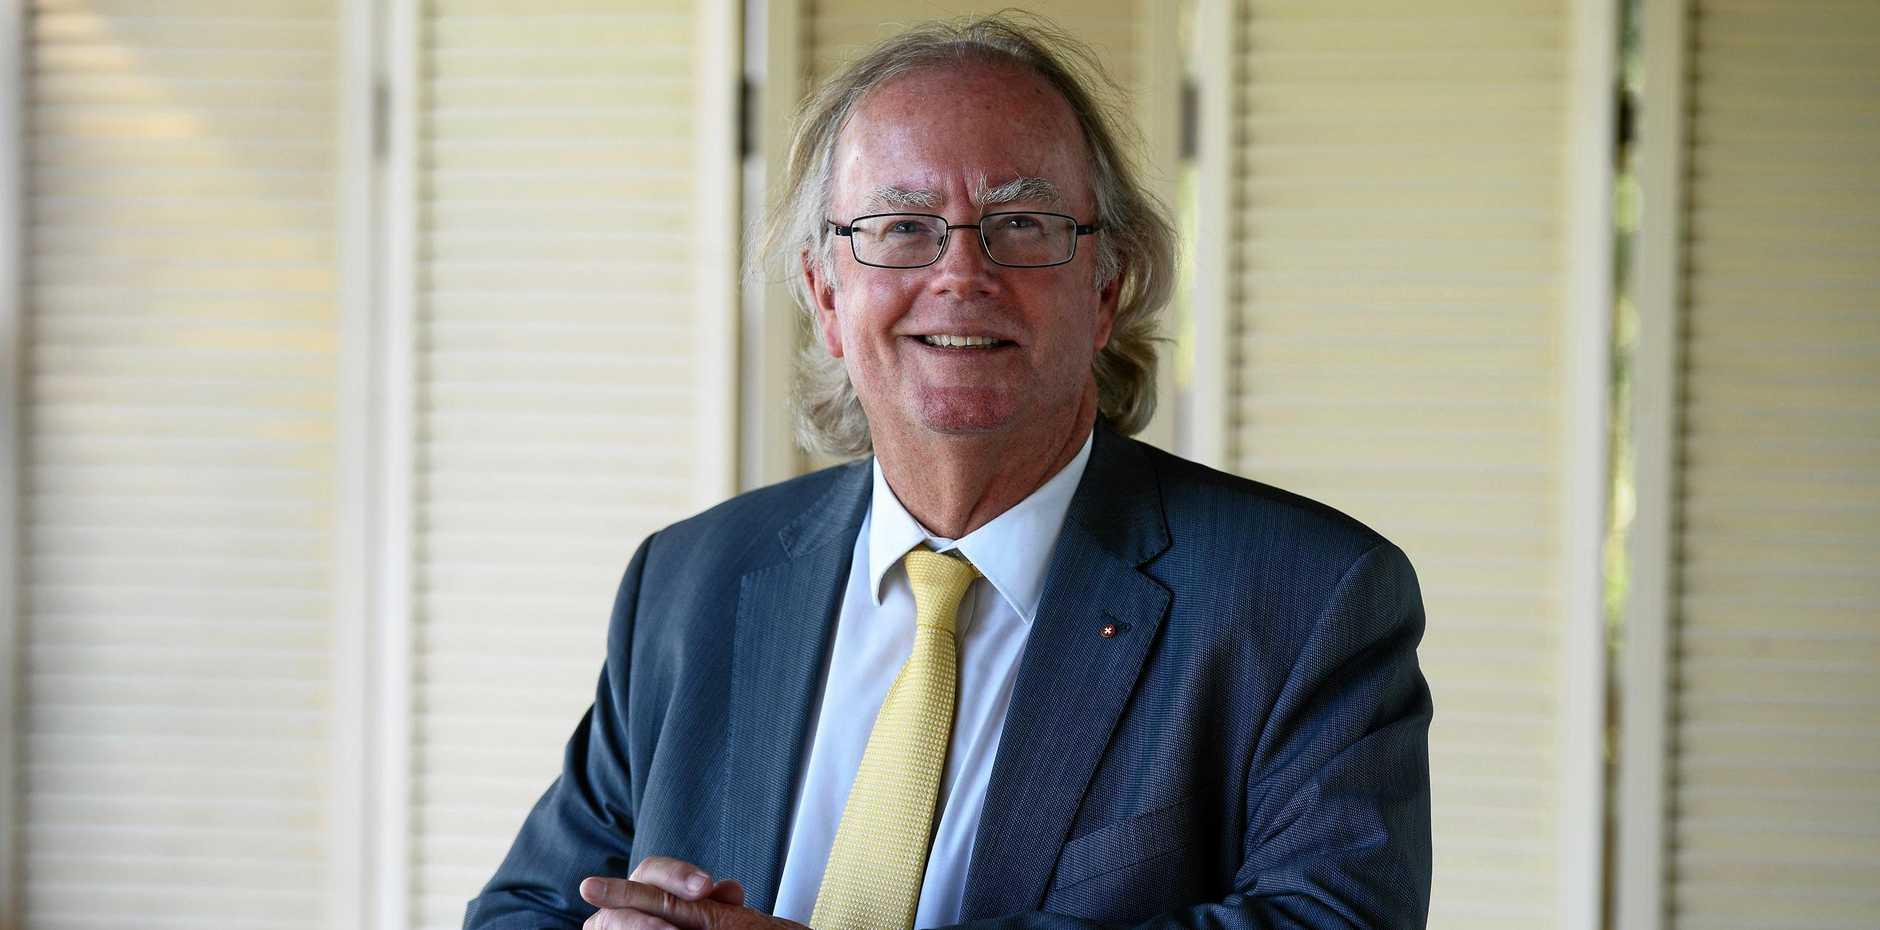 Clem Jones Group chairman David Muir at the Bundaberg parliamentary hearing.